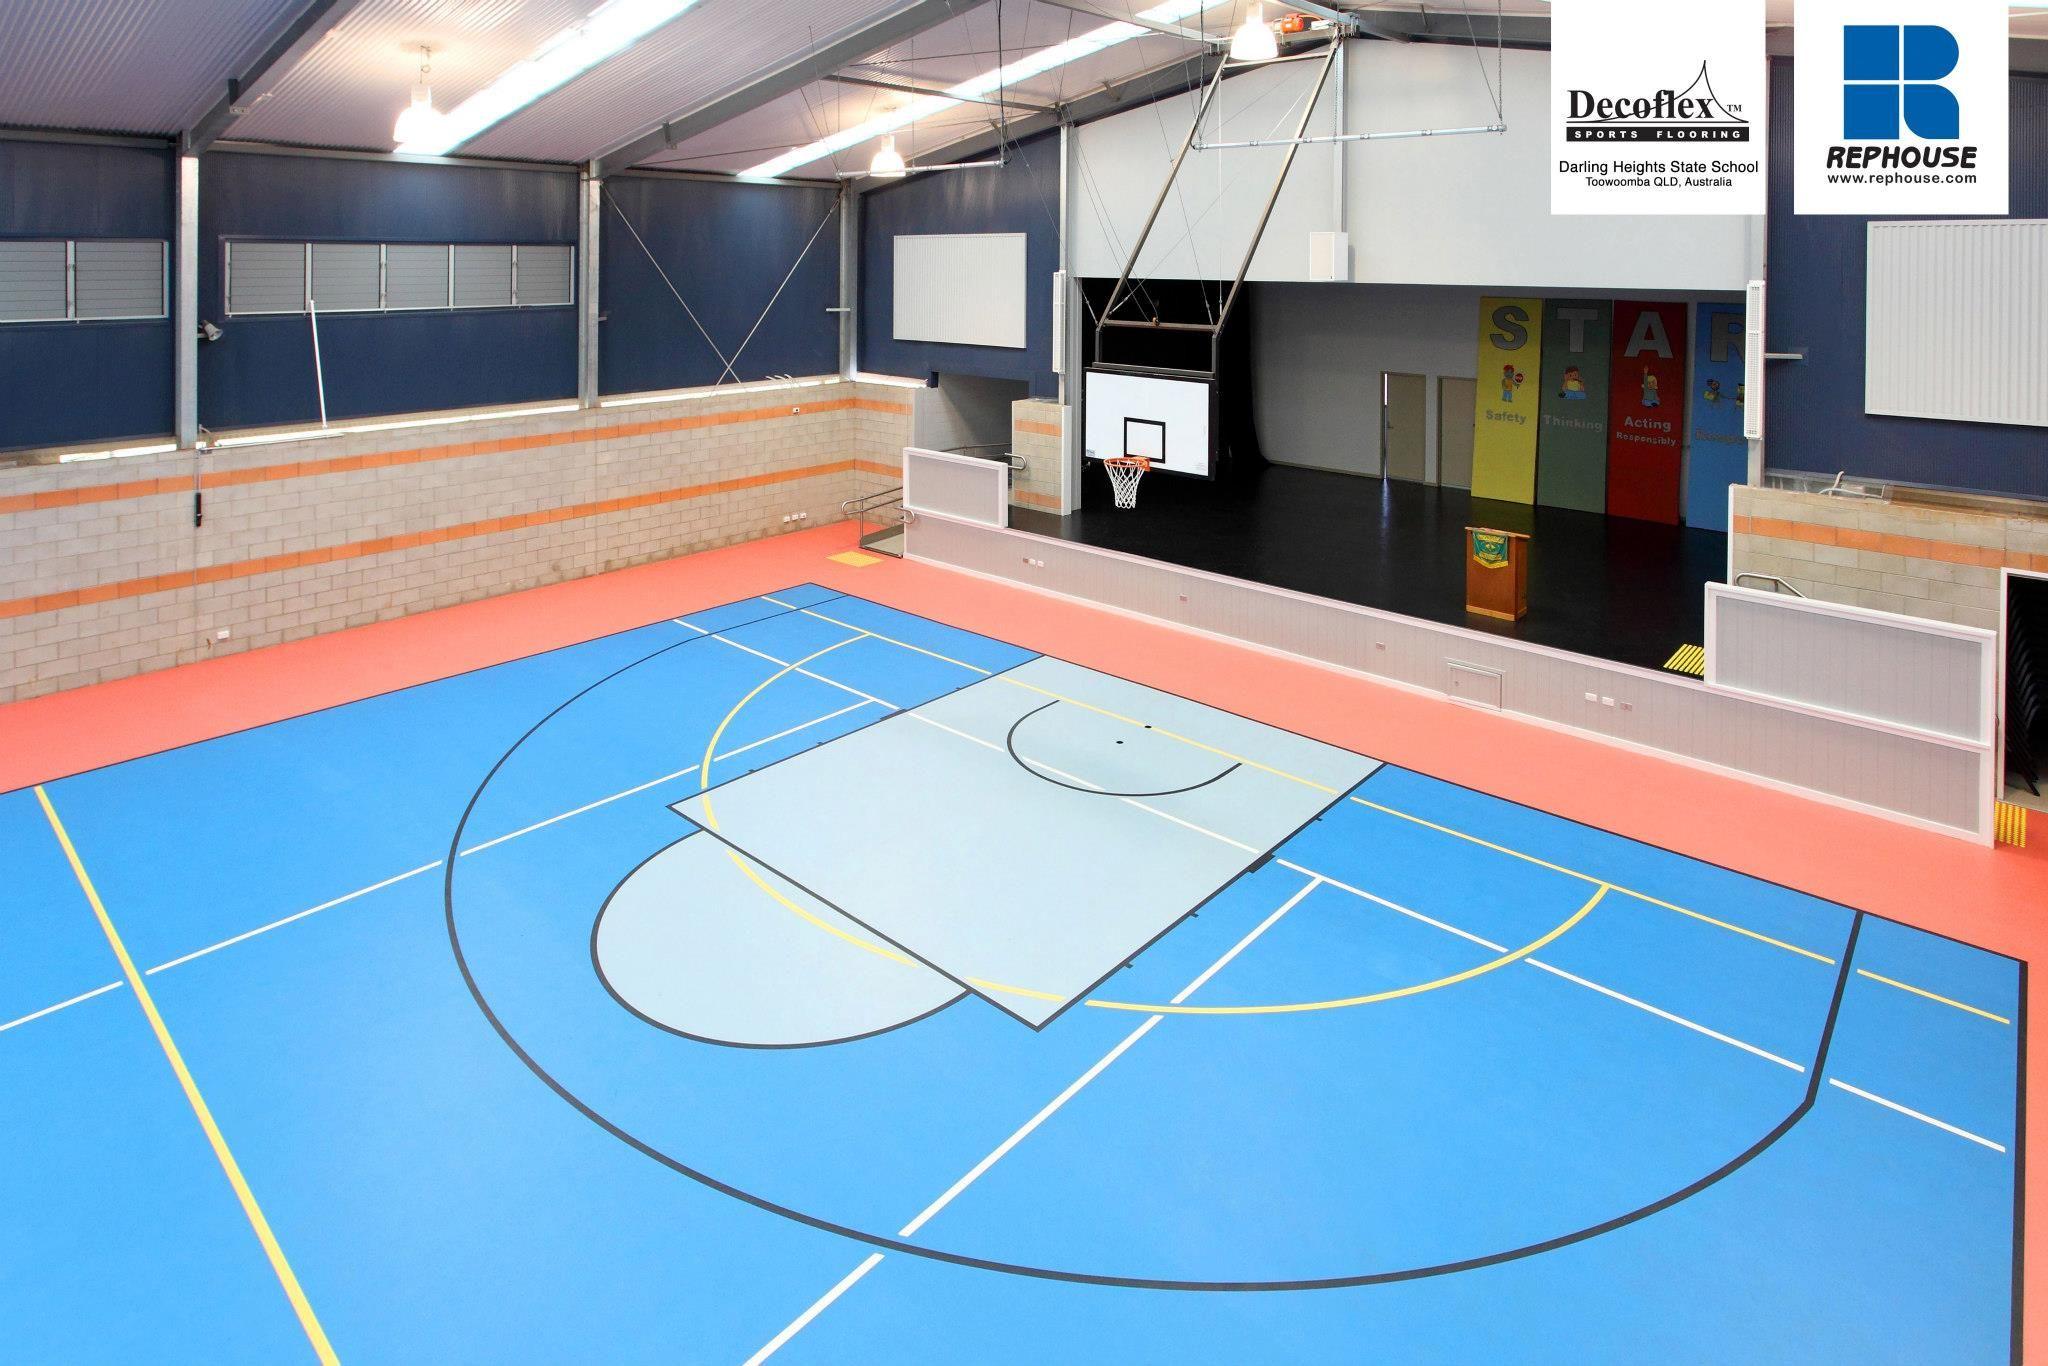 Decoflex Universal Seamless Polyurethane Indoor Sports Flooring Darling Heights State School Australia Indoor Sports State School Australia